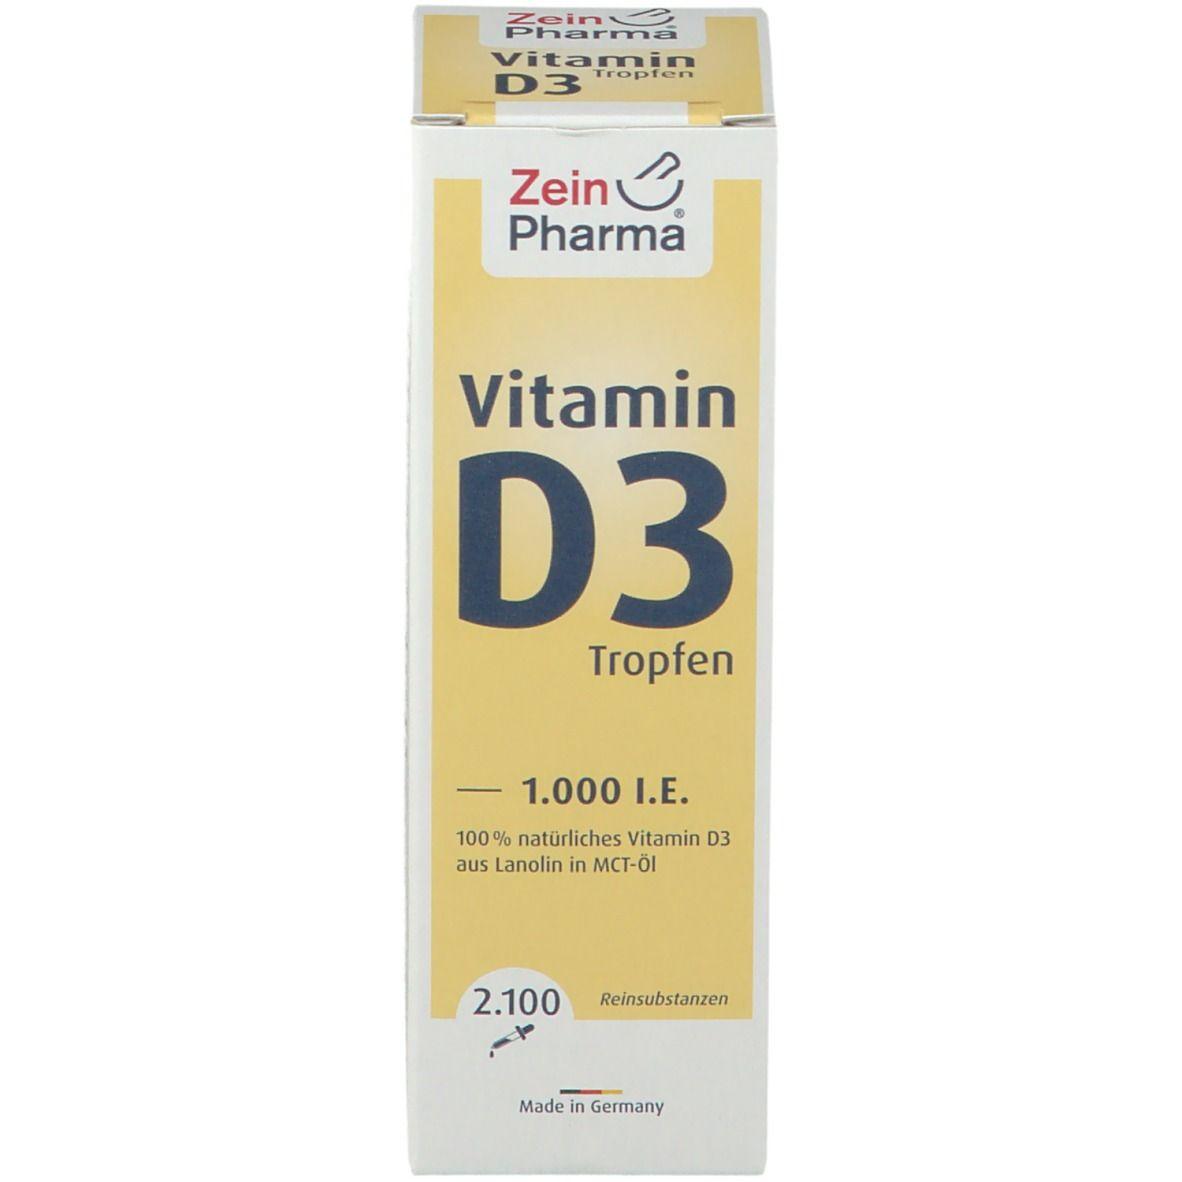 Vitamin D3 Tropfen 1.000 I.E. ZeinPharma